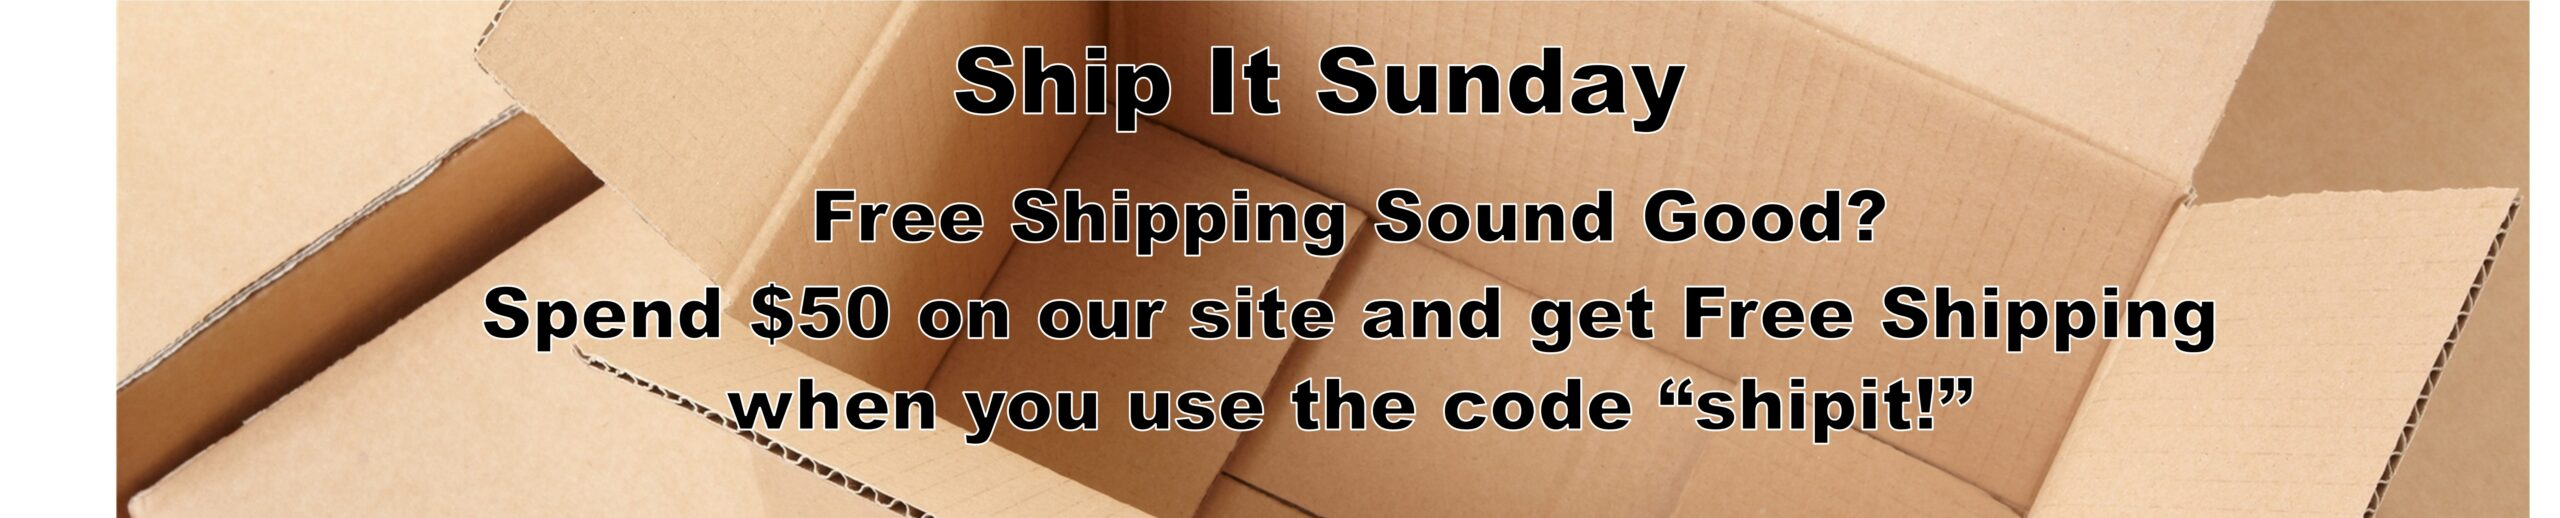 Ship it2